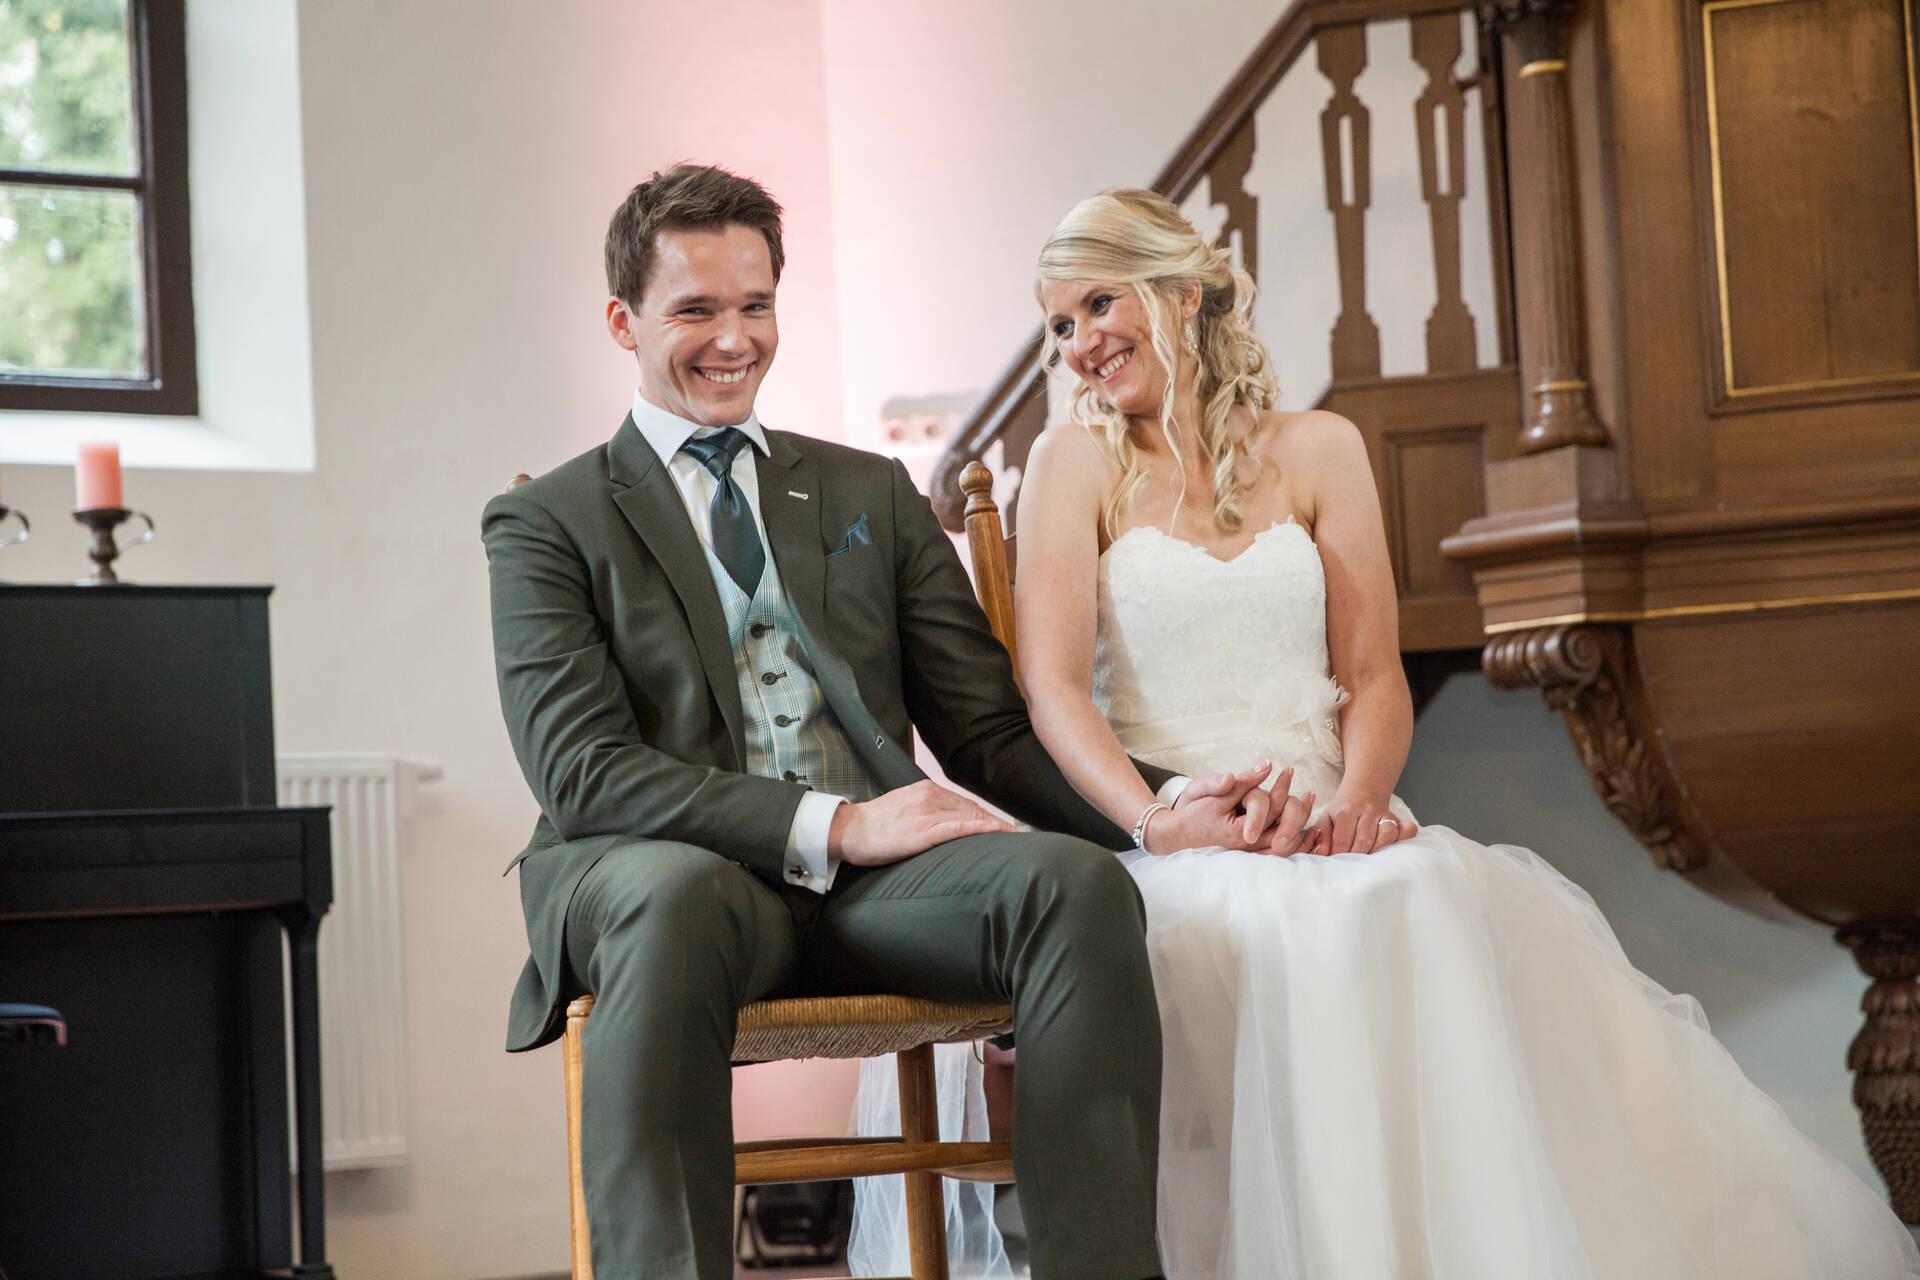 Mosgroen trouwpak met geruite gilet en leuke details